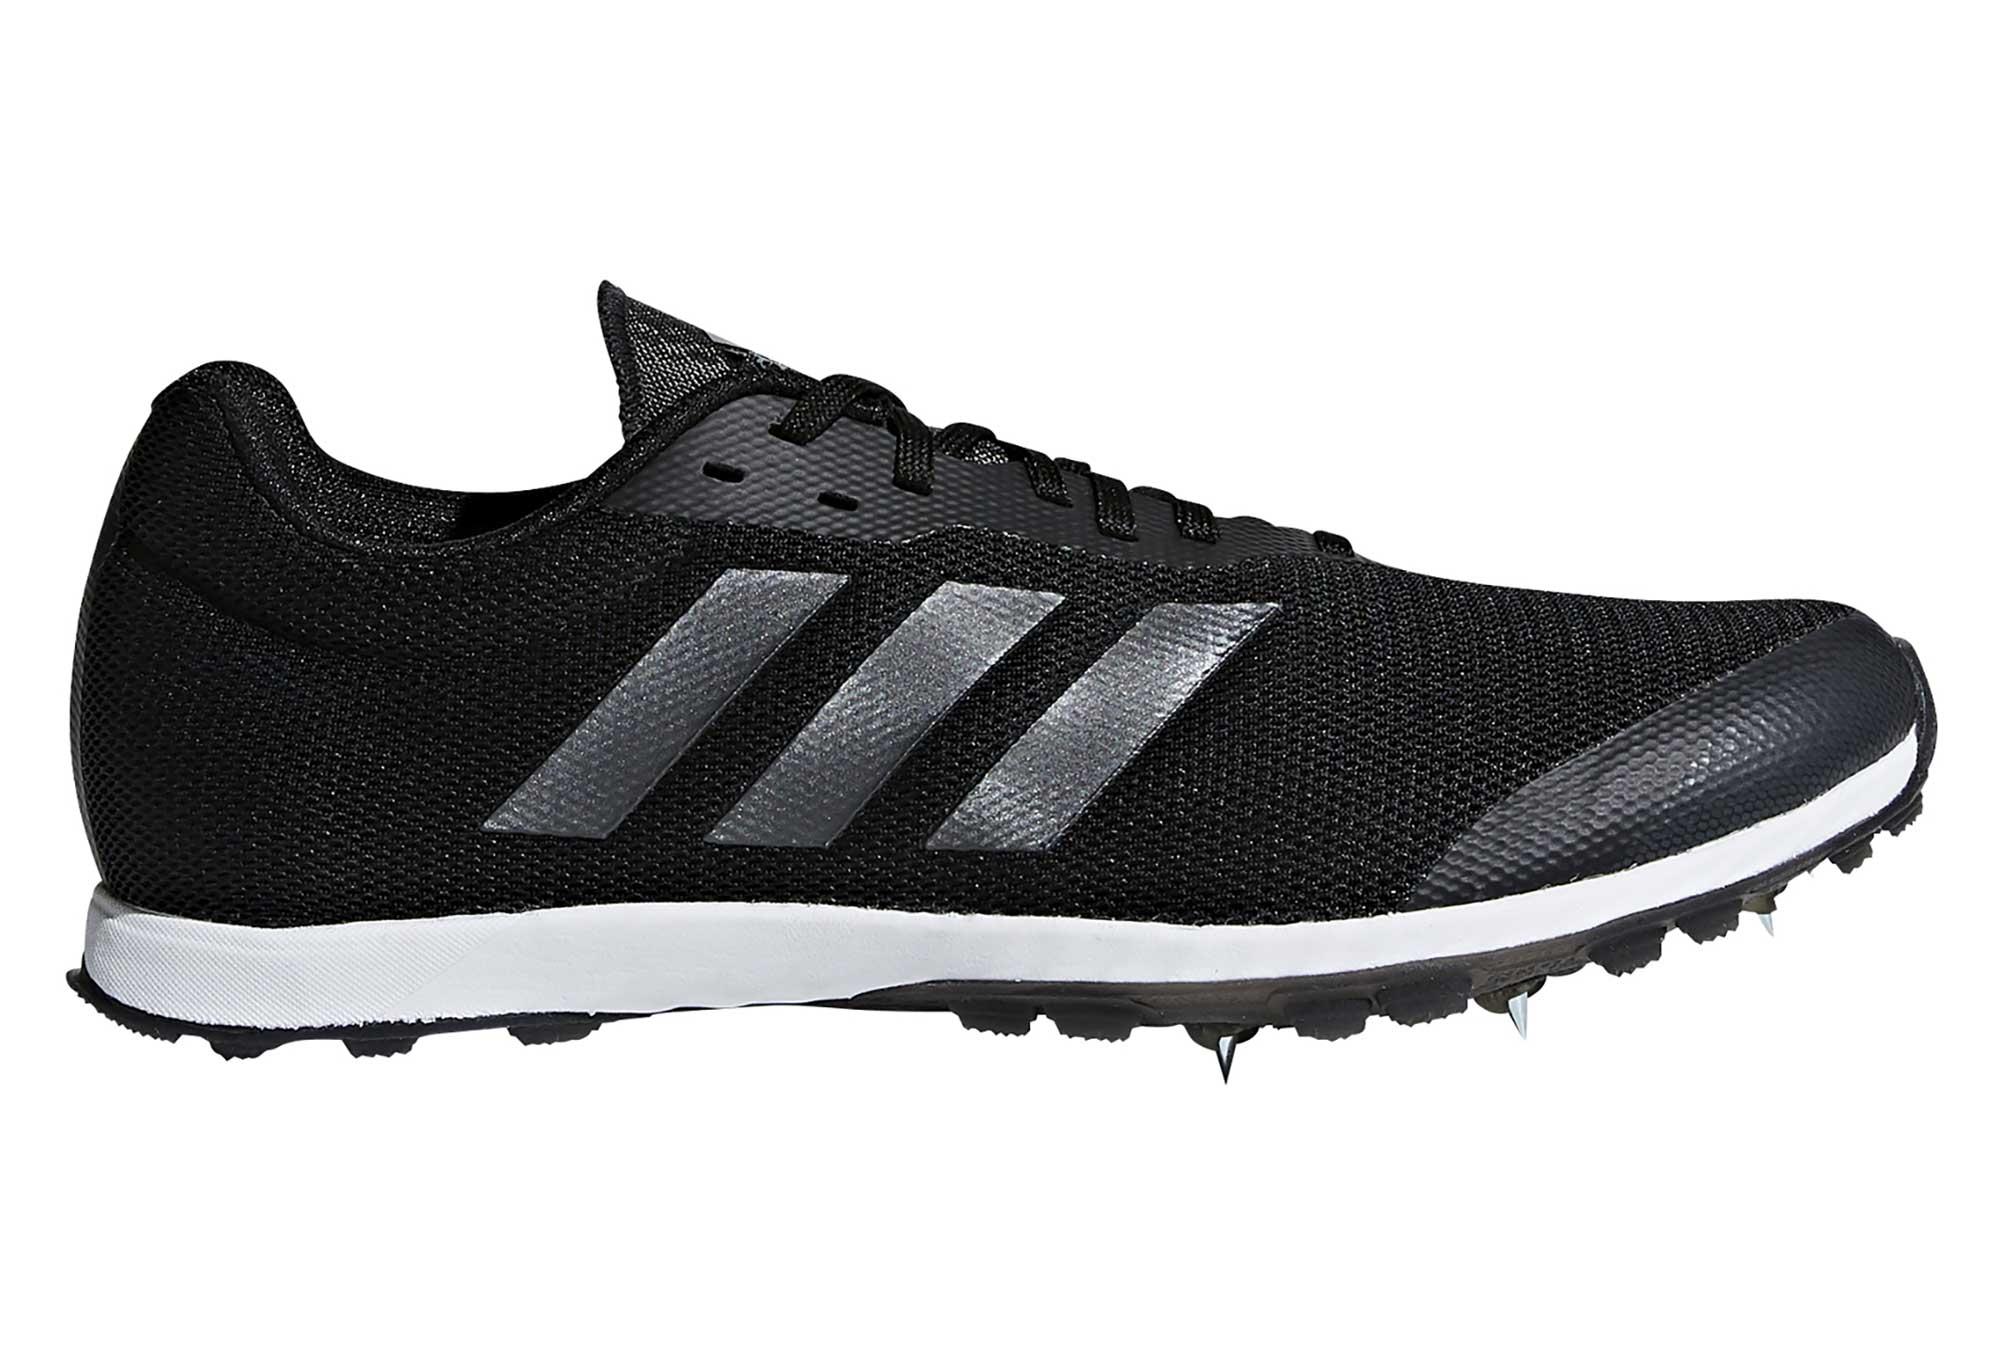 Adidas Xcs Homme Cross Country Running Spikes Noir | eBay